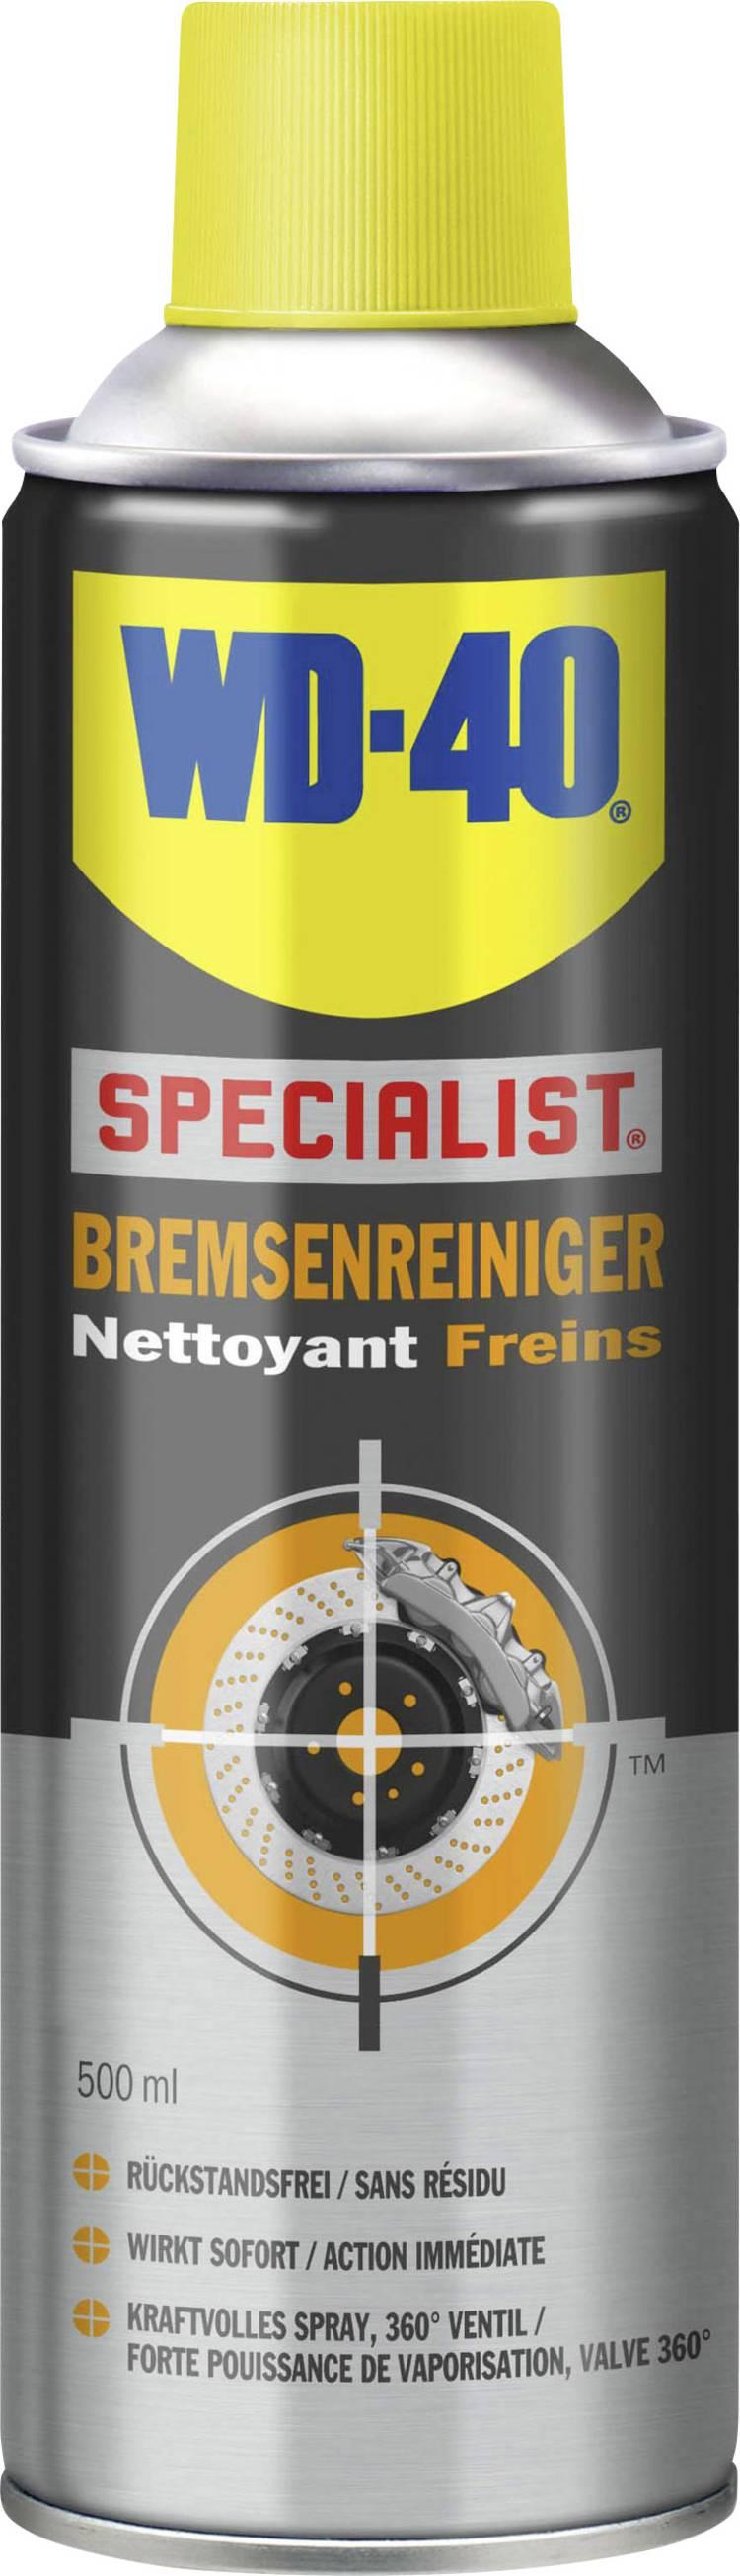 Remmenreiniger 500 ml WD40 Company Specialist 49975